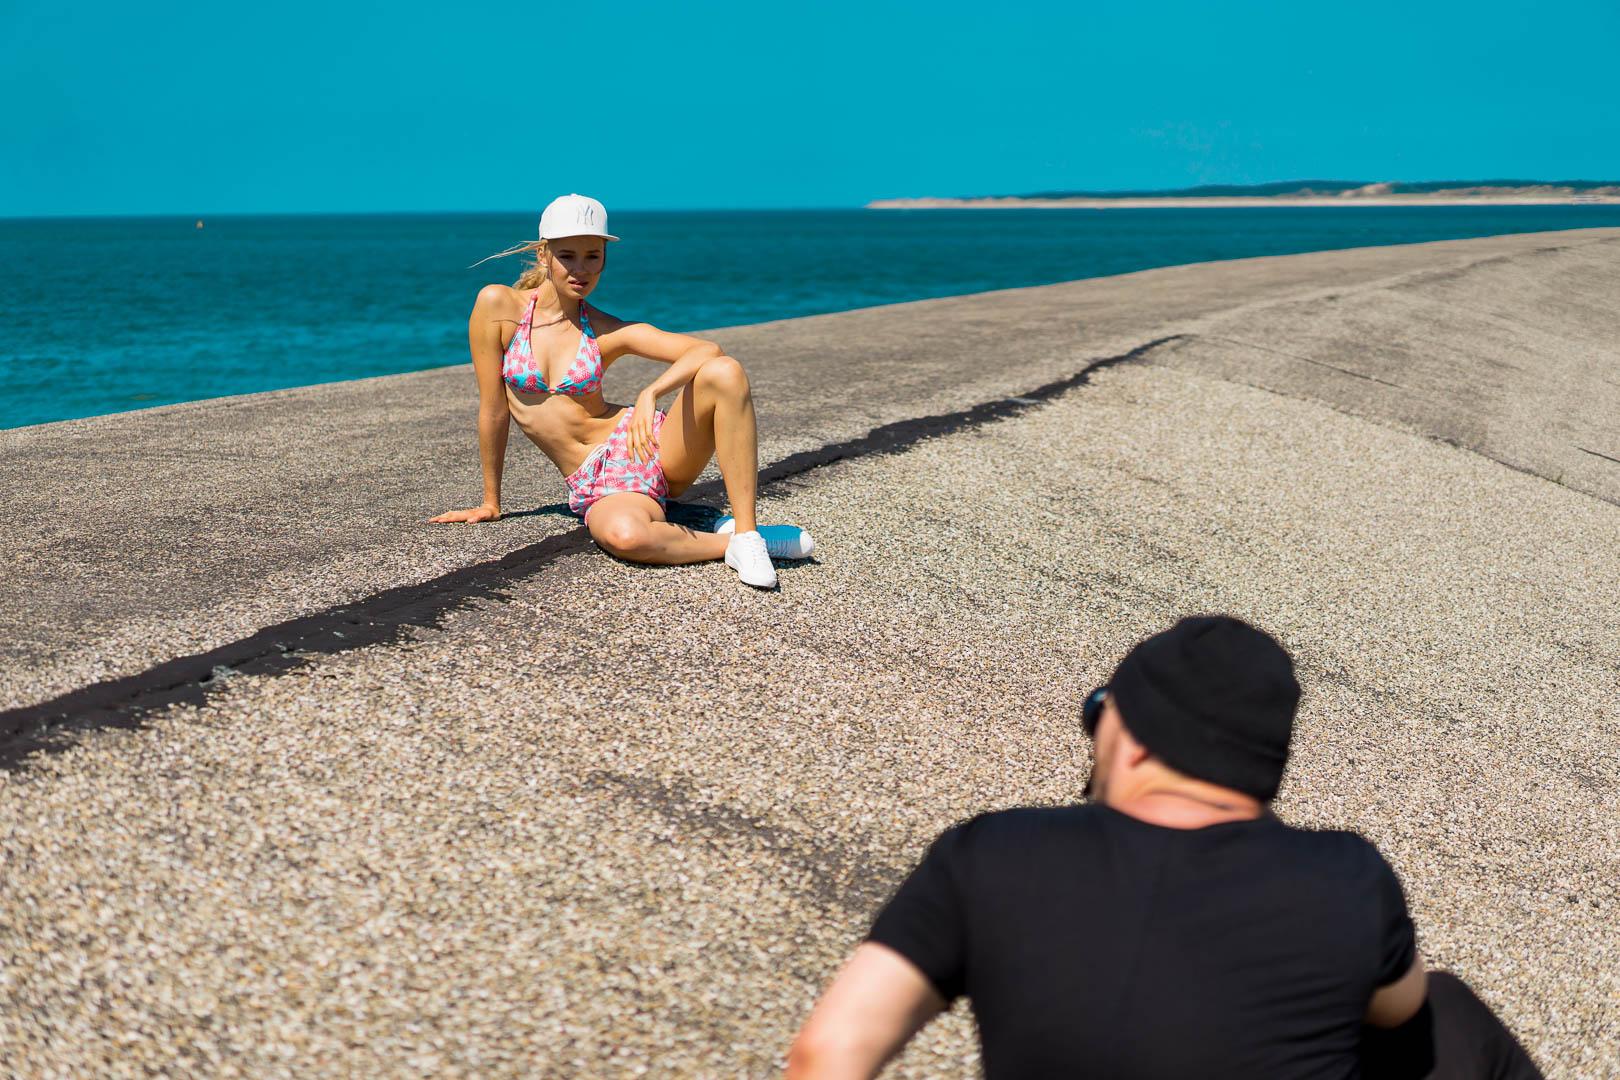 photographer-shooting-editorial-modeling-agency-bikini-sporty-zara-netherlands